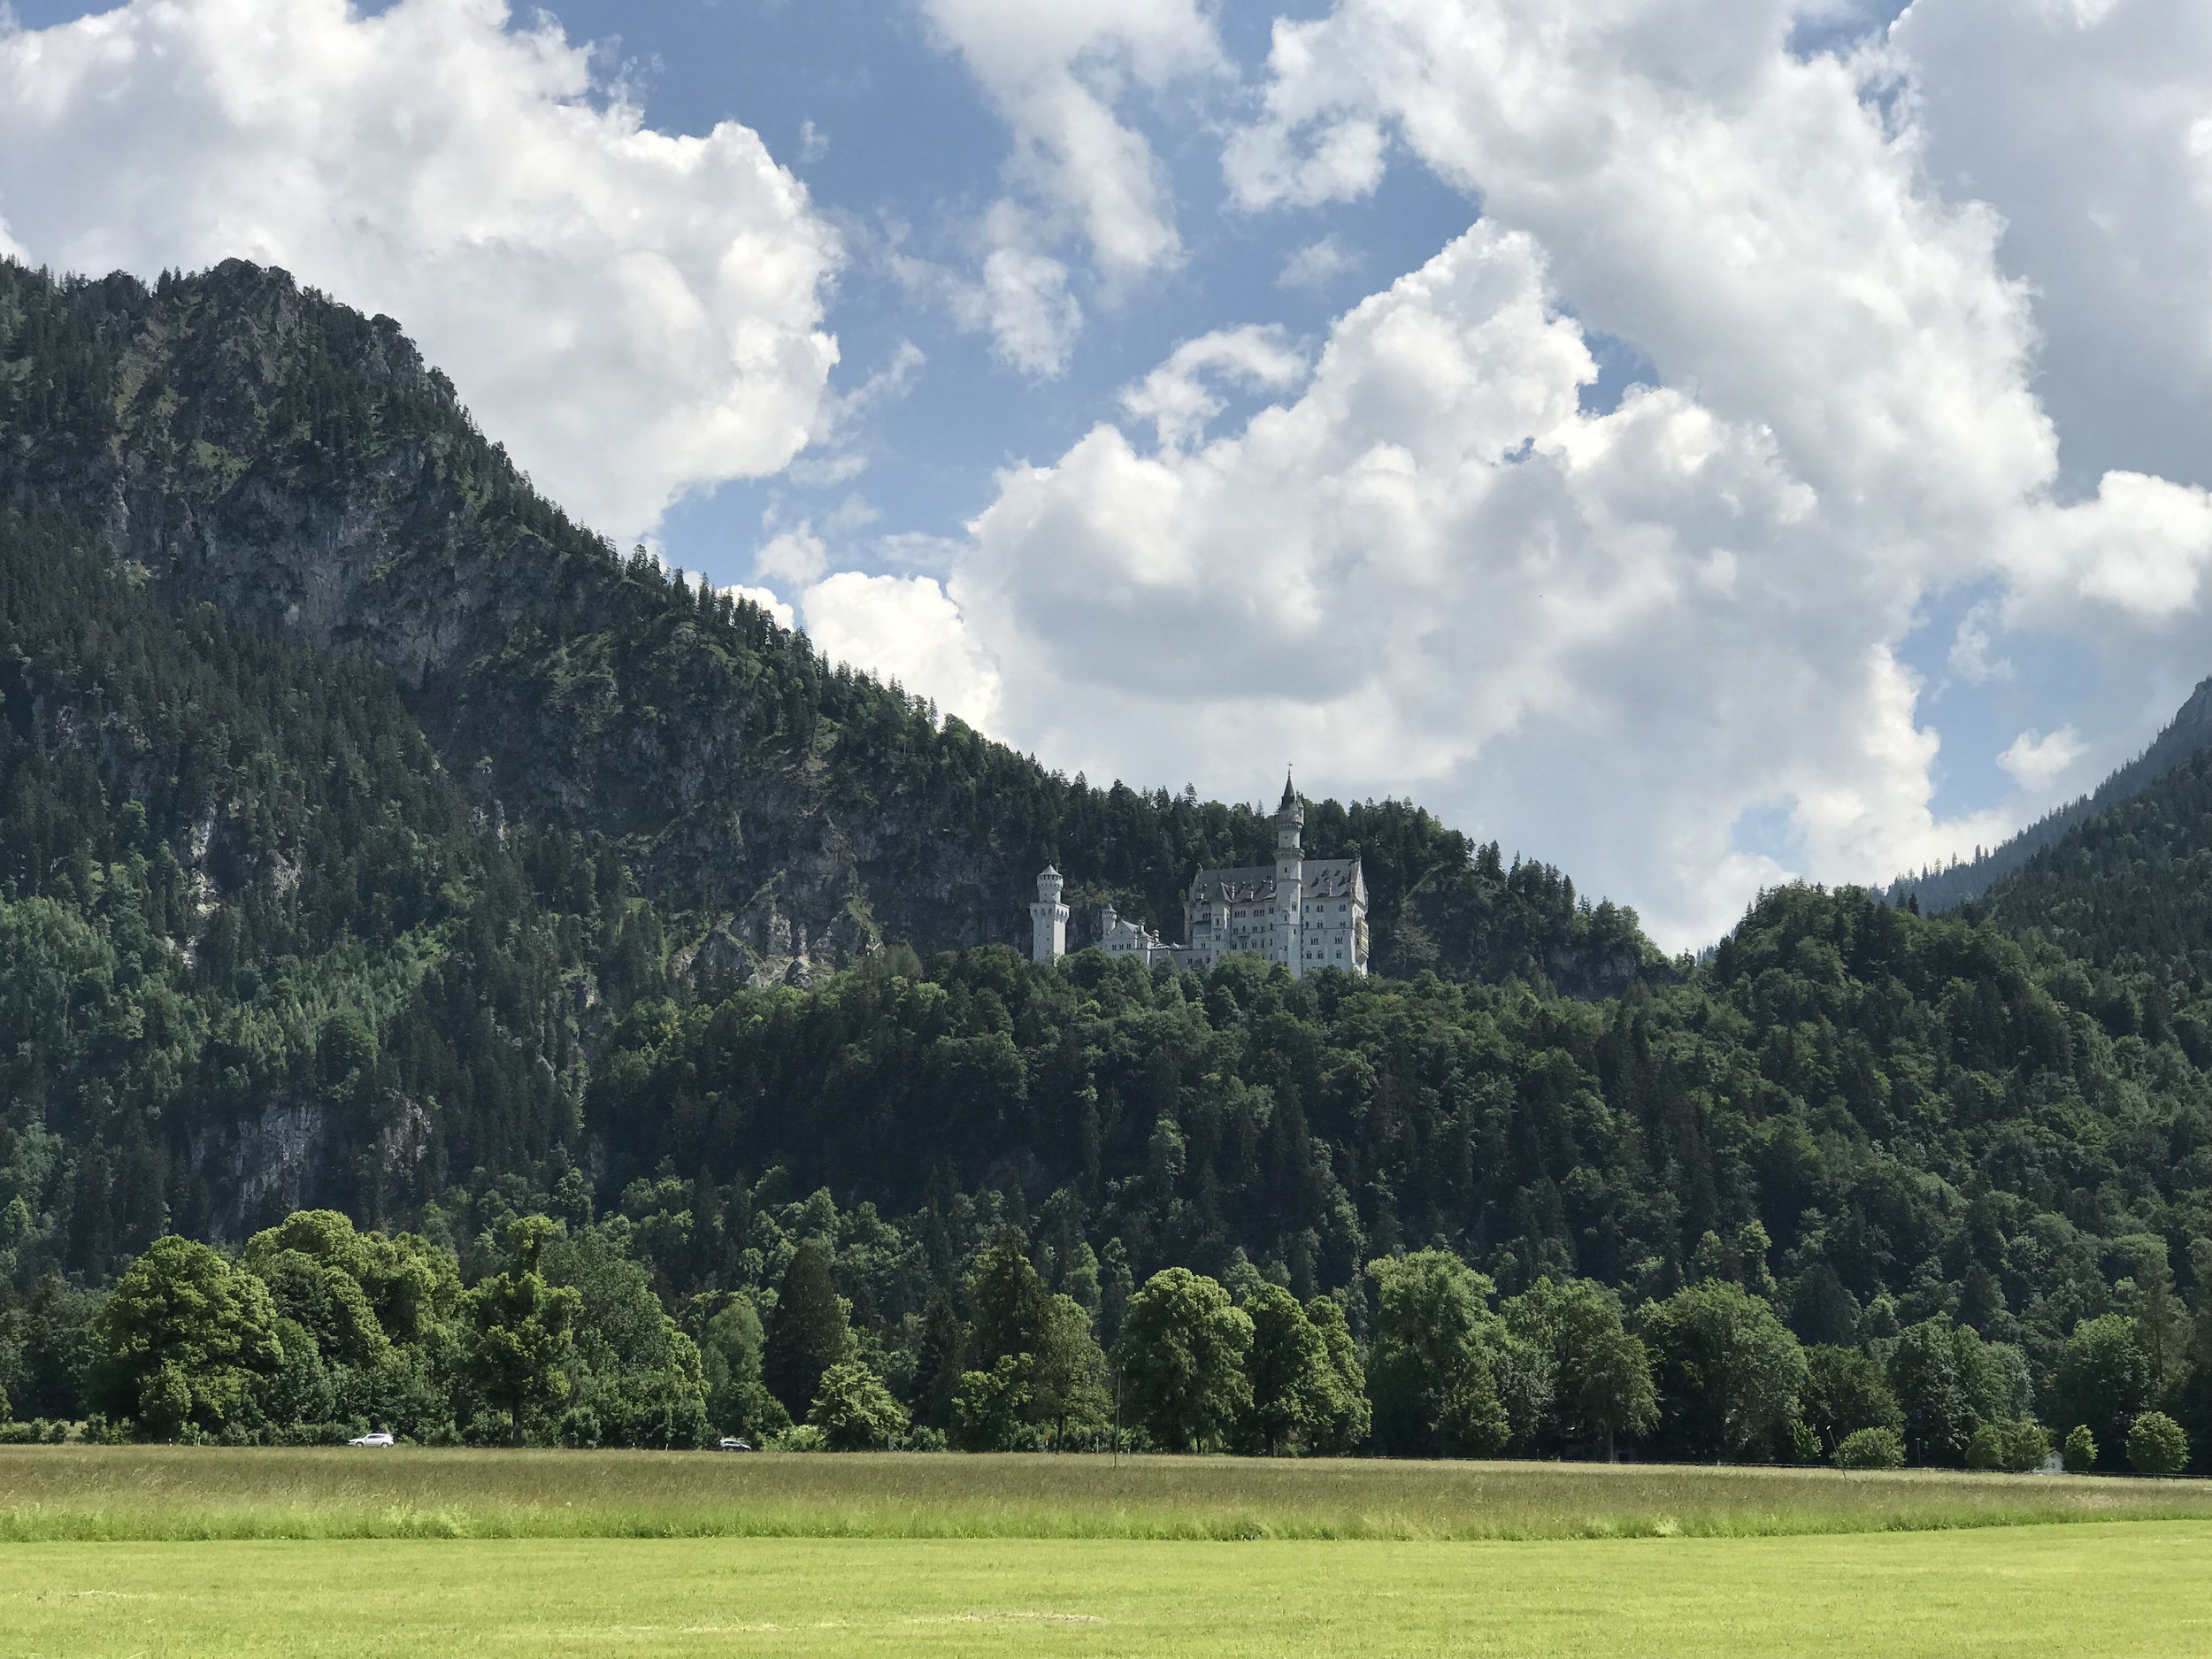 Teri_Day2_Castles_Germany&Austria_spiritedtable_photo32.jpg